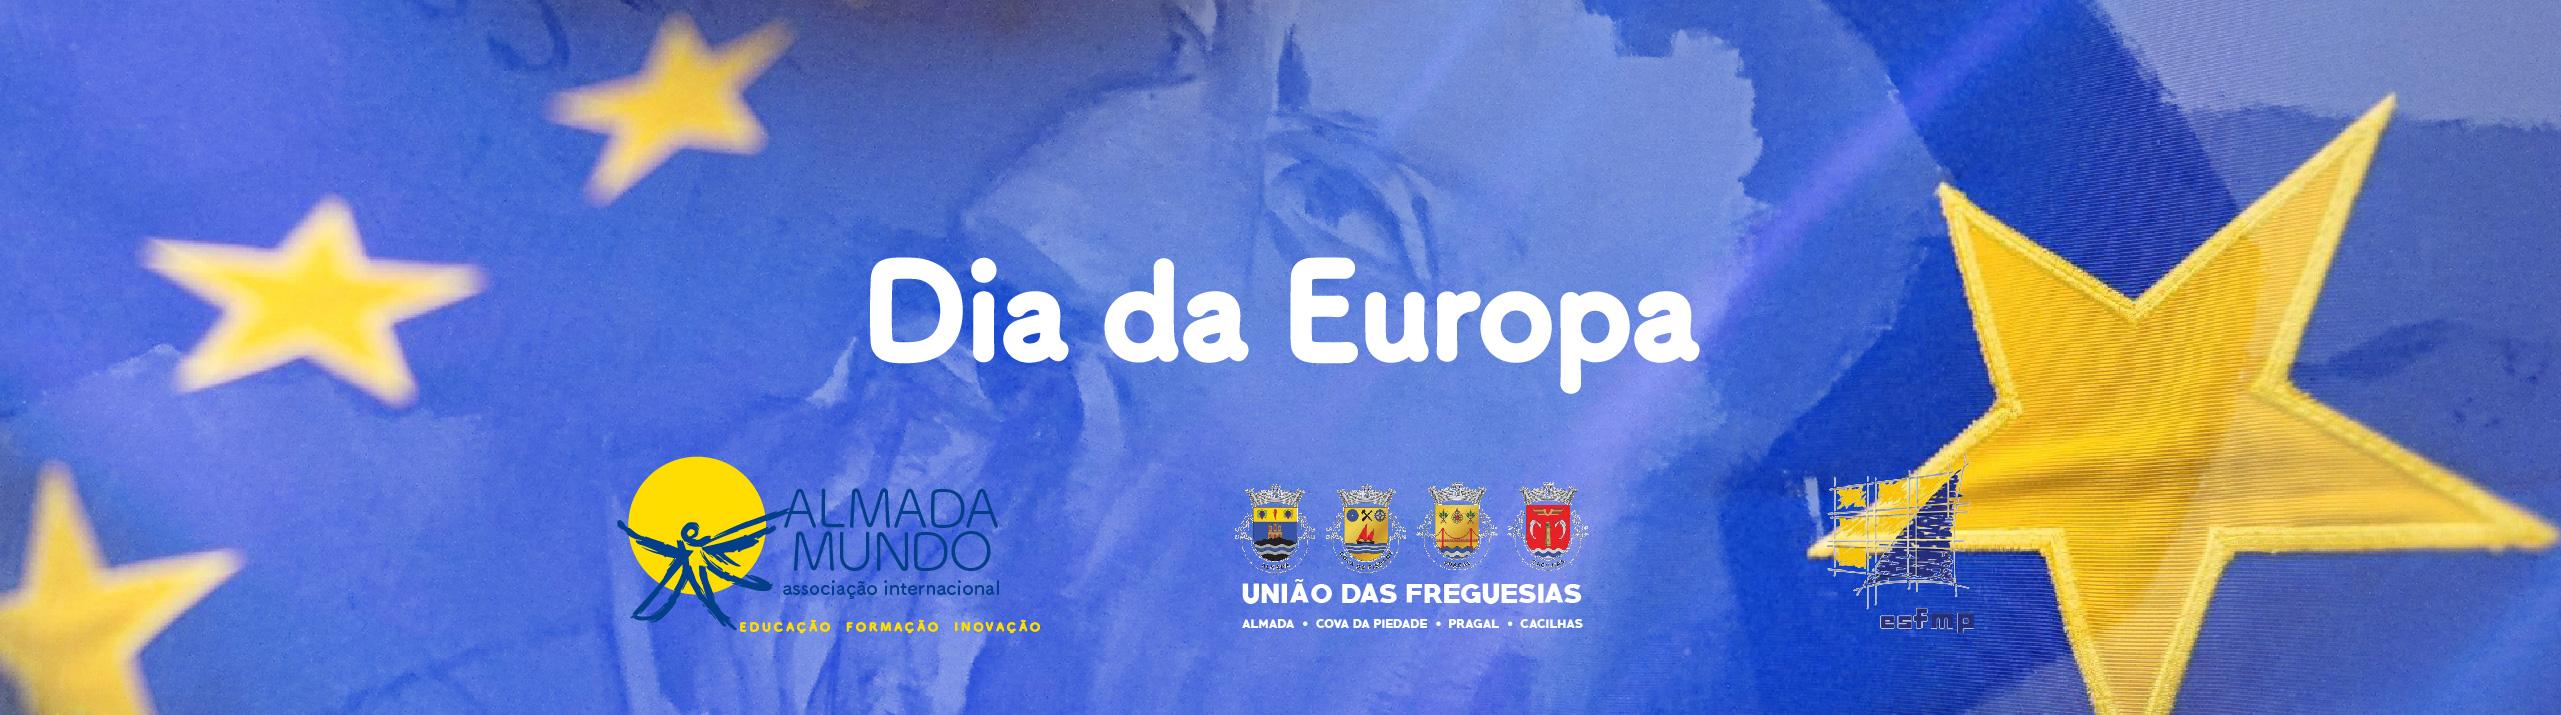 banner_diaeuropaArtboard 4@2x-80